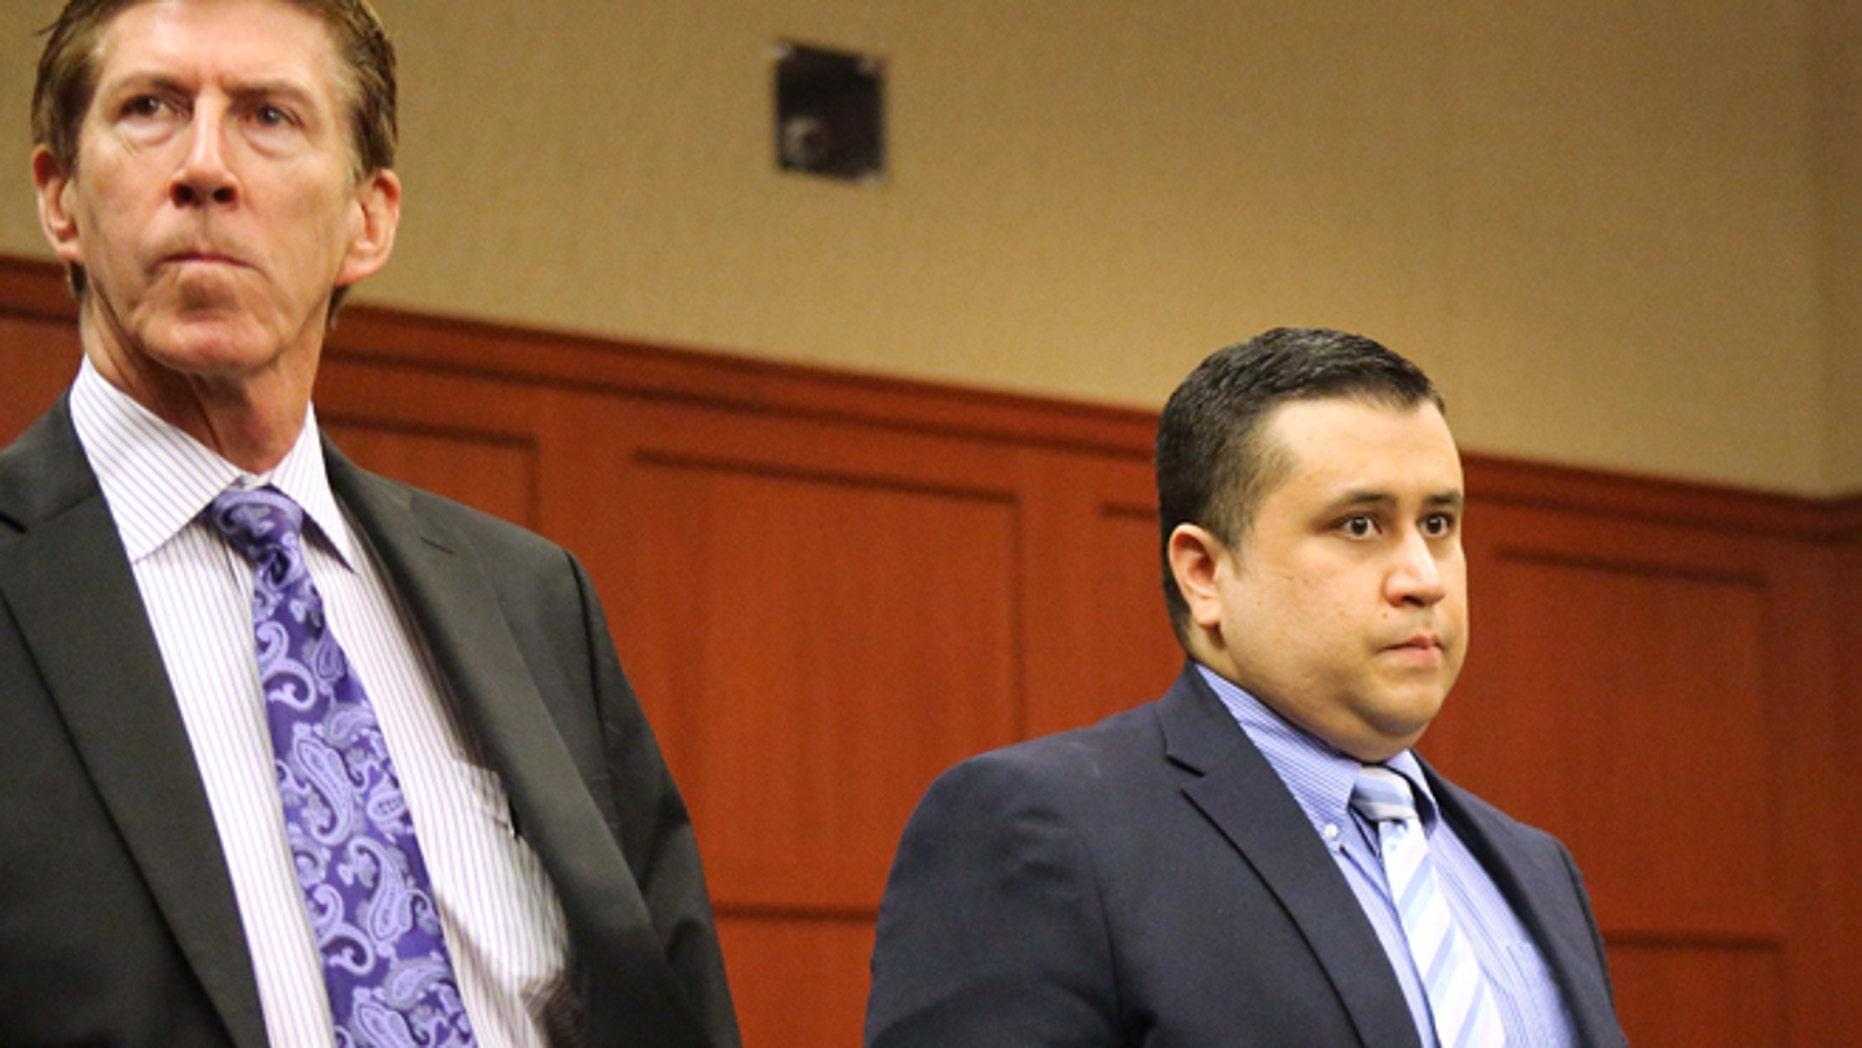 Feb. 5: George Zimmerman, right, wears a bulletproof vest in public, Mark O'Mara, left, his attorney, says.